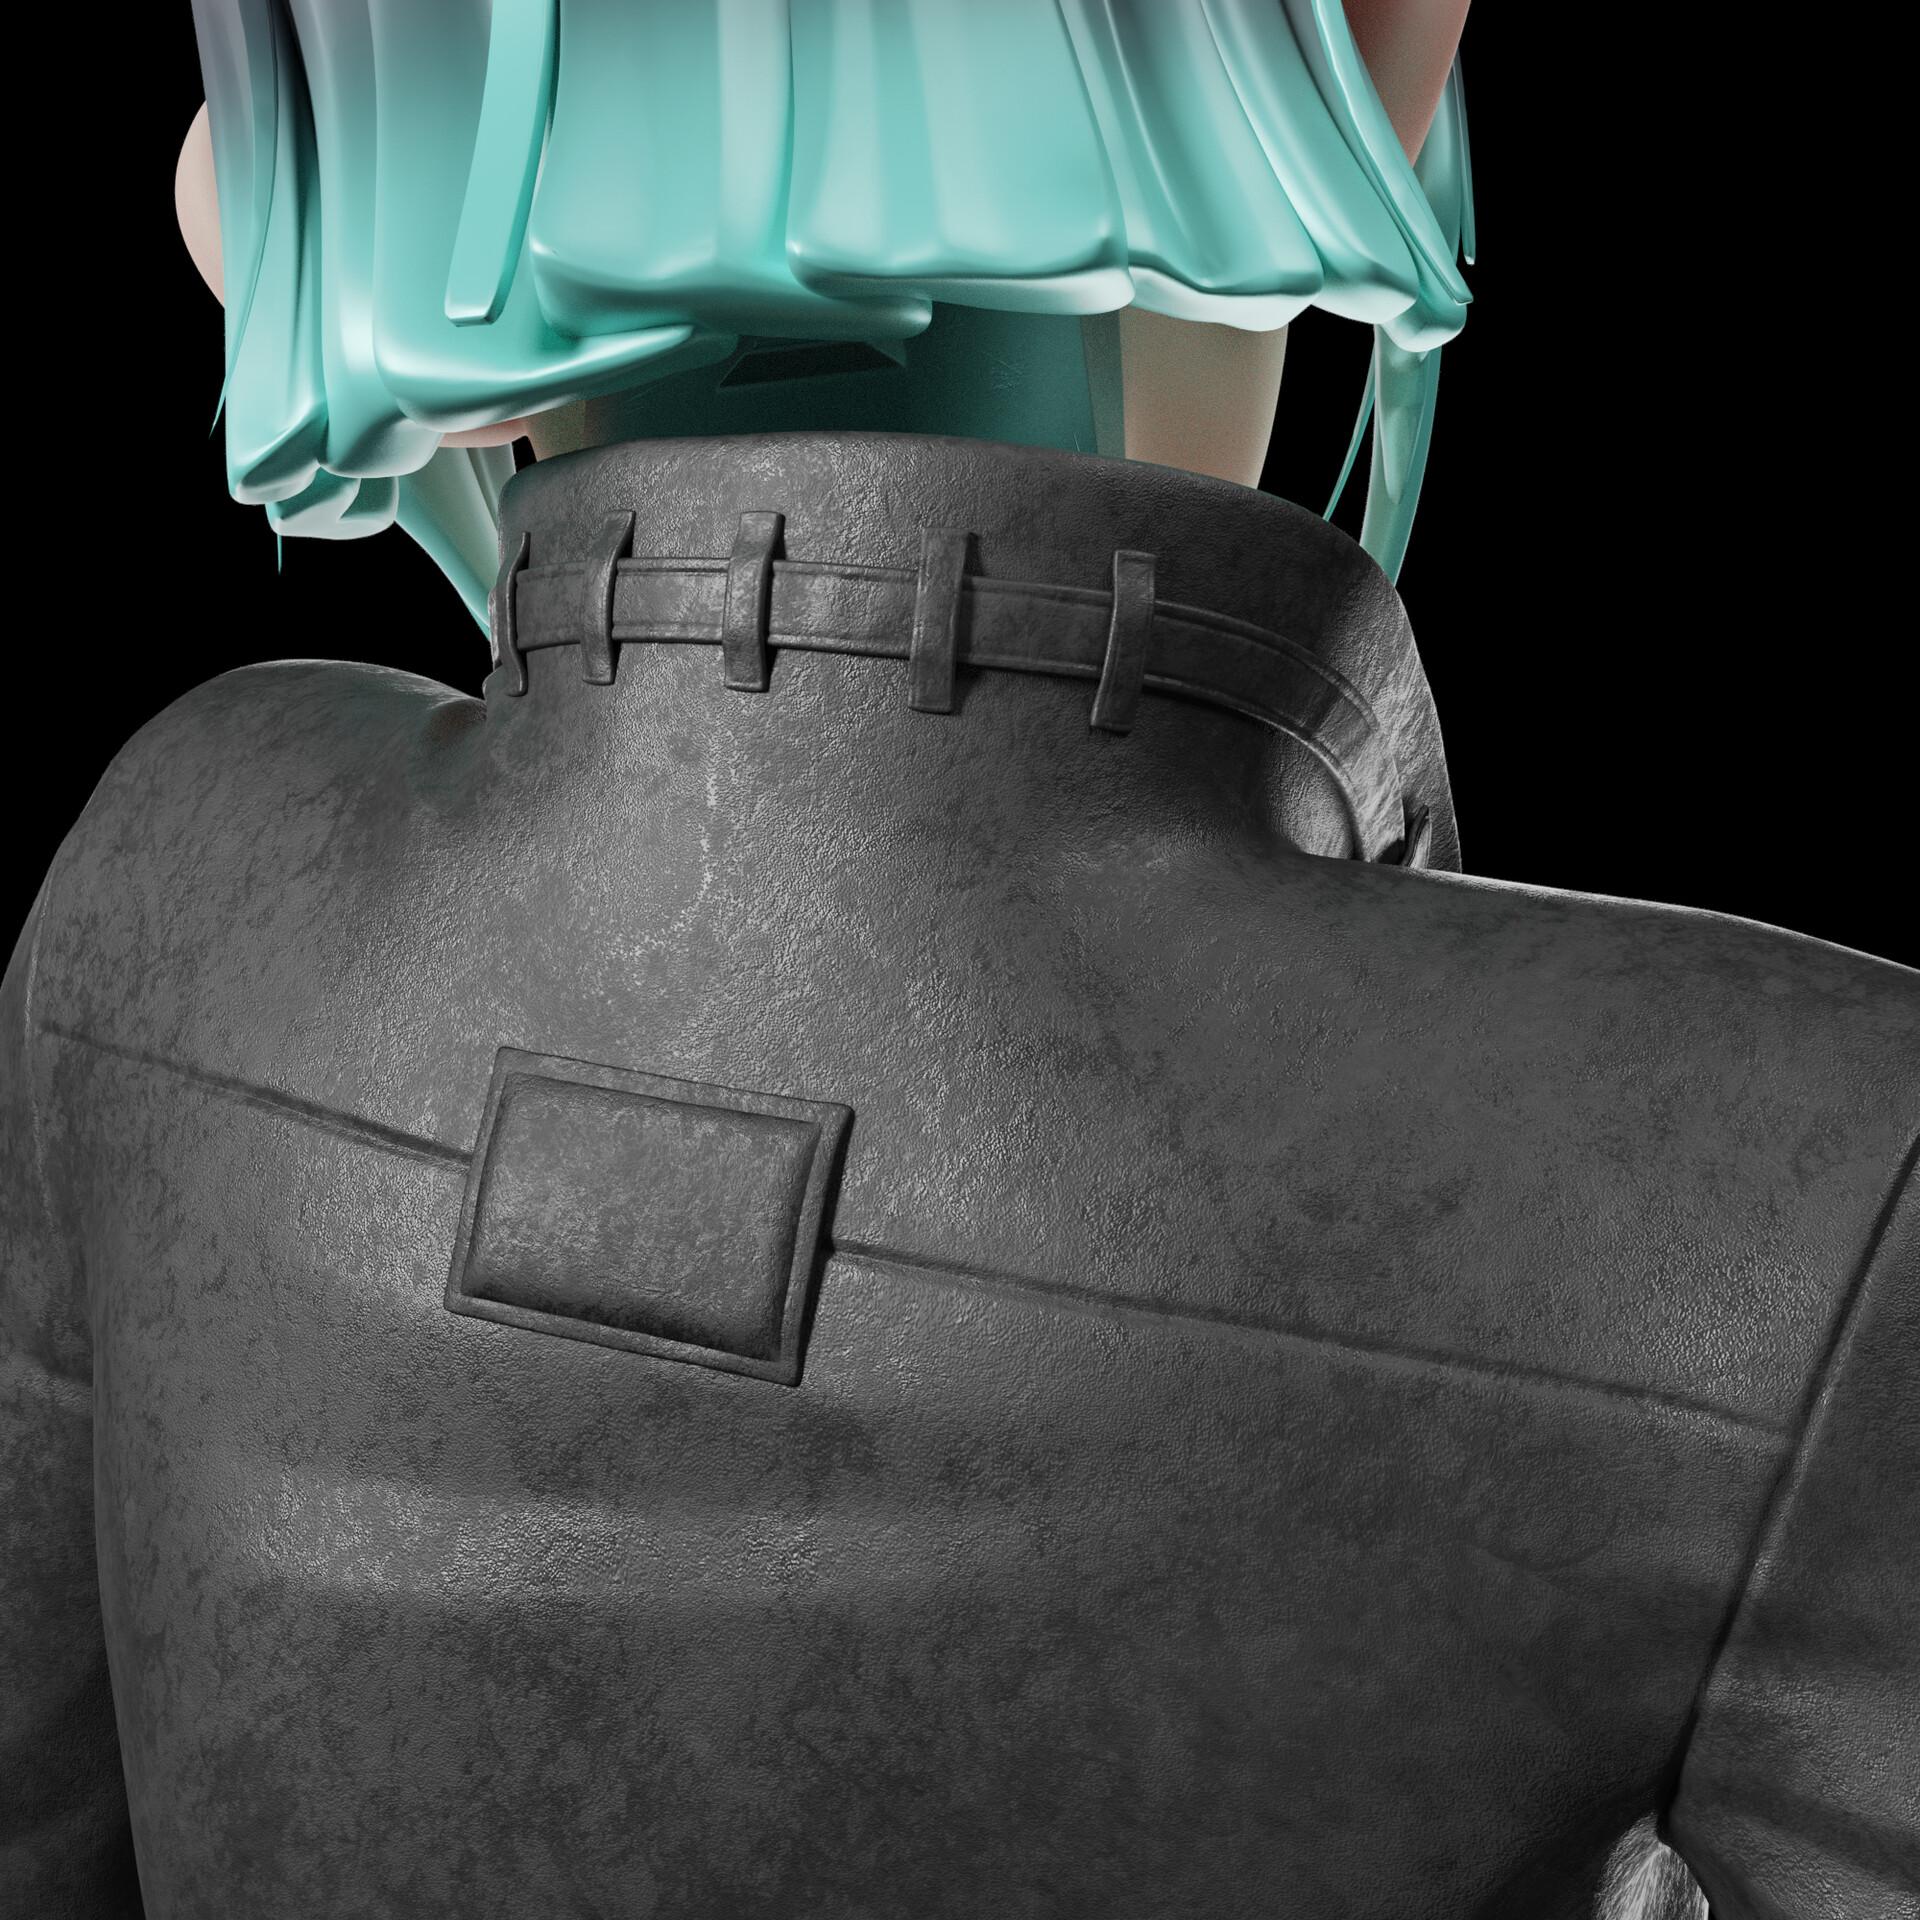 Sergi camprubi detail color render 07